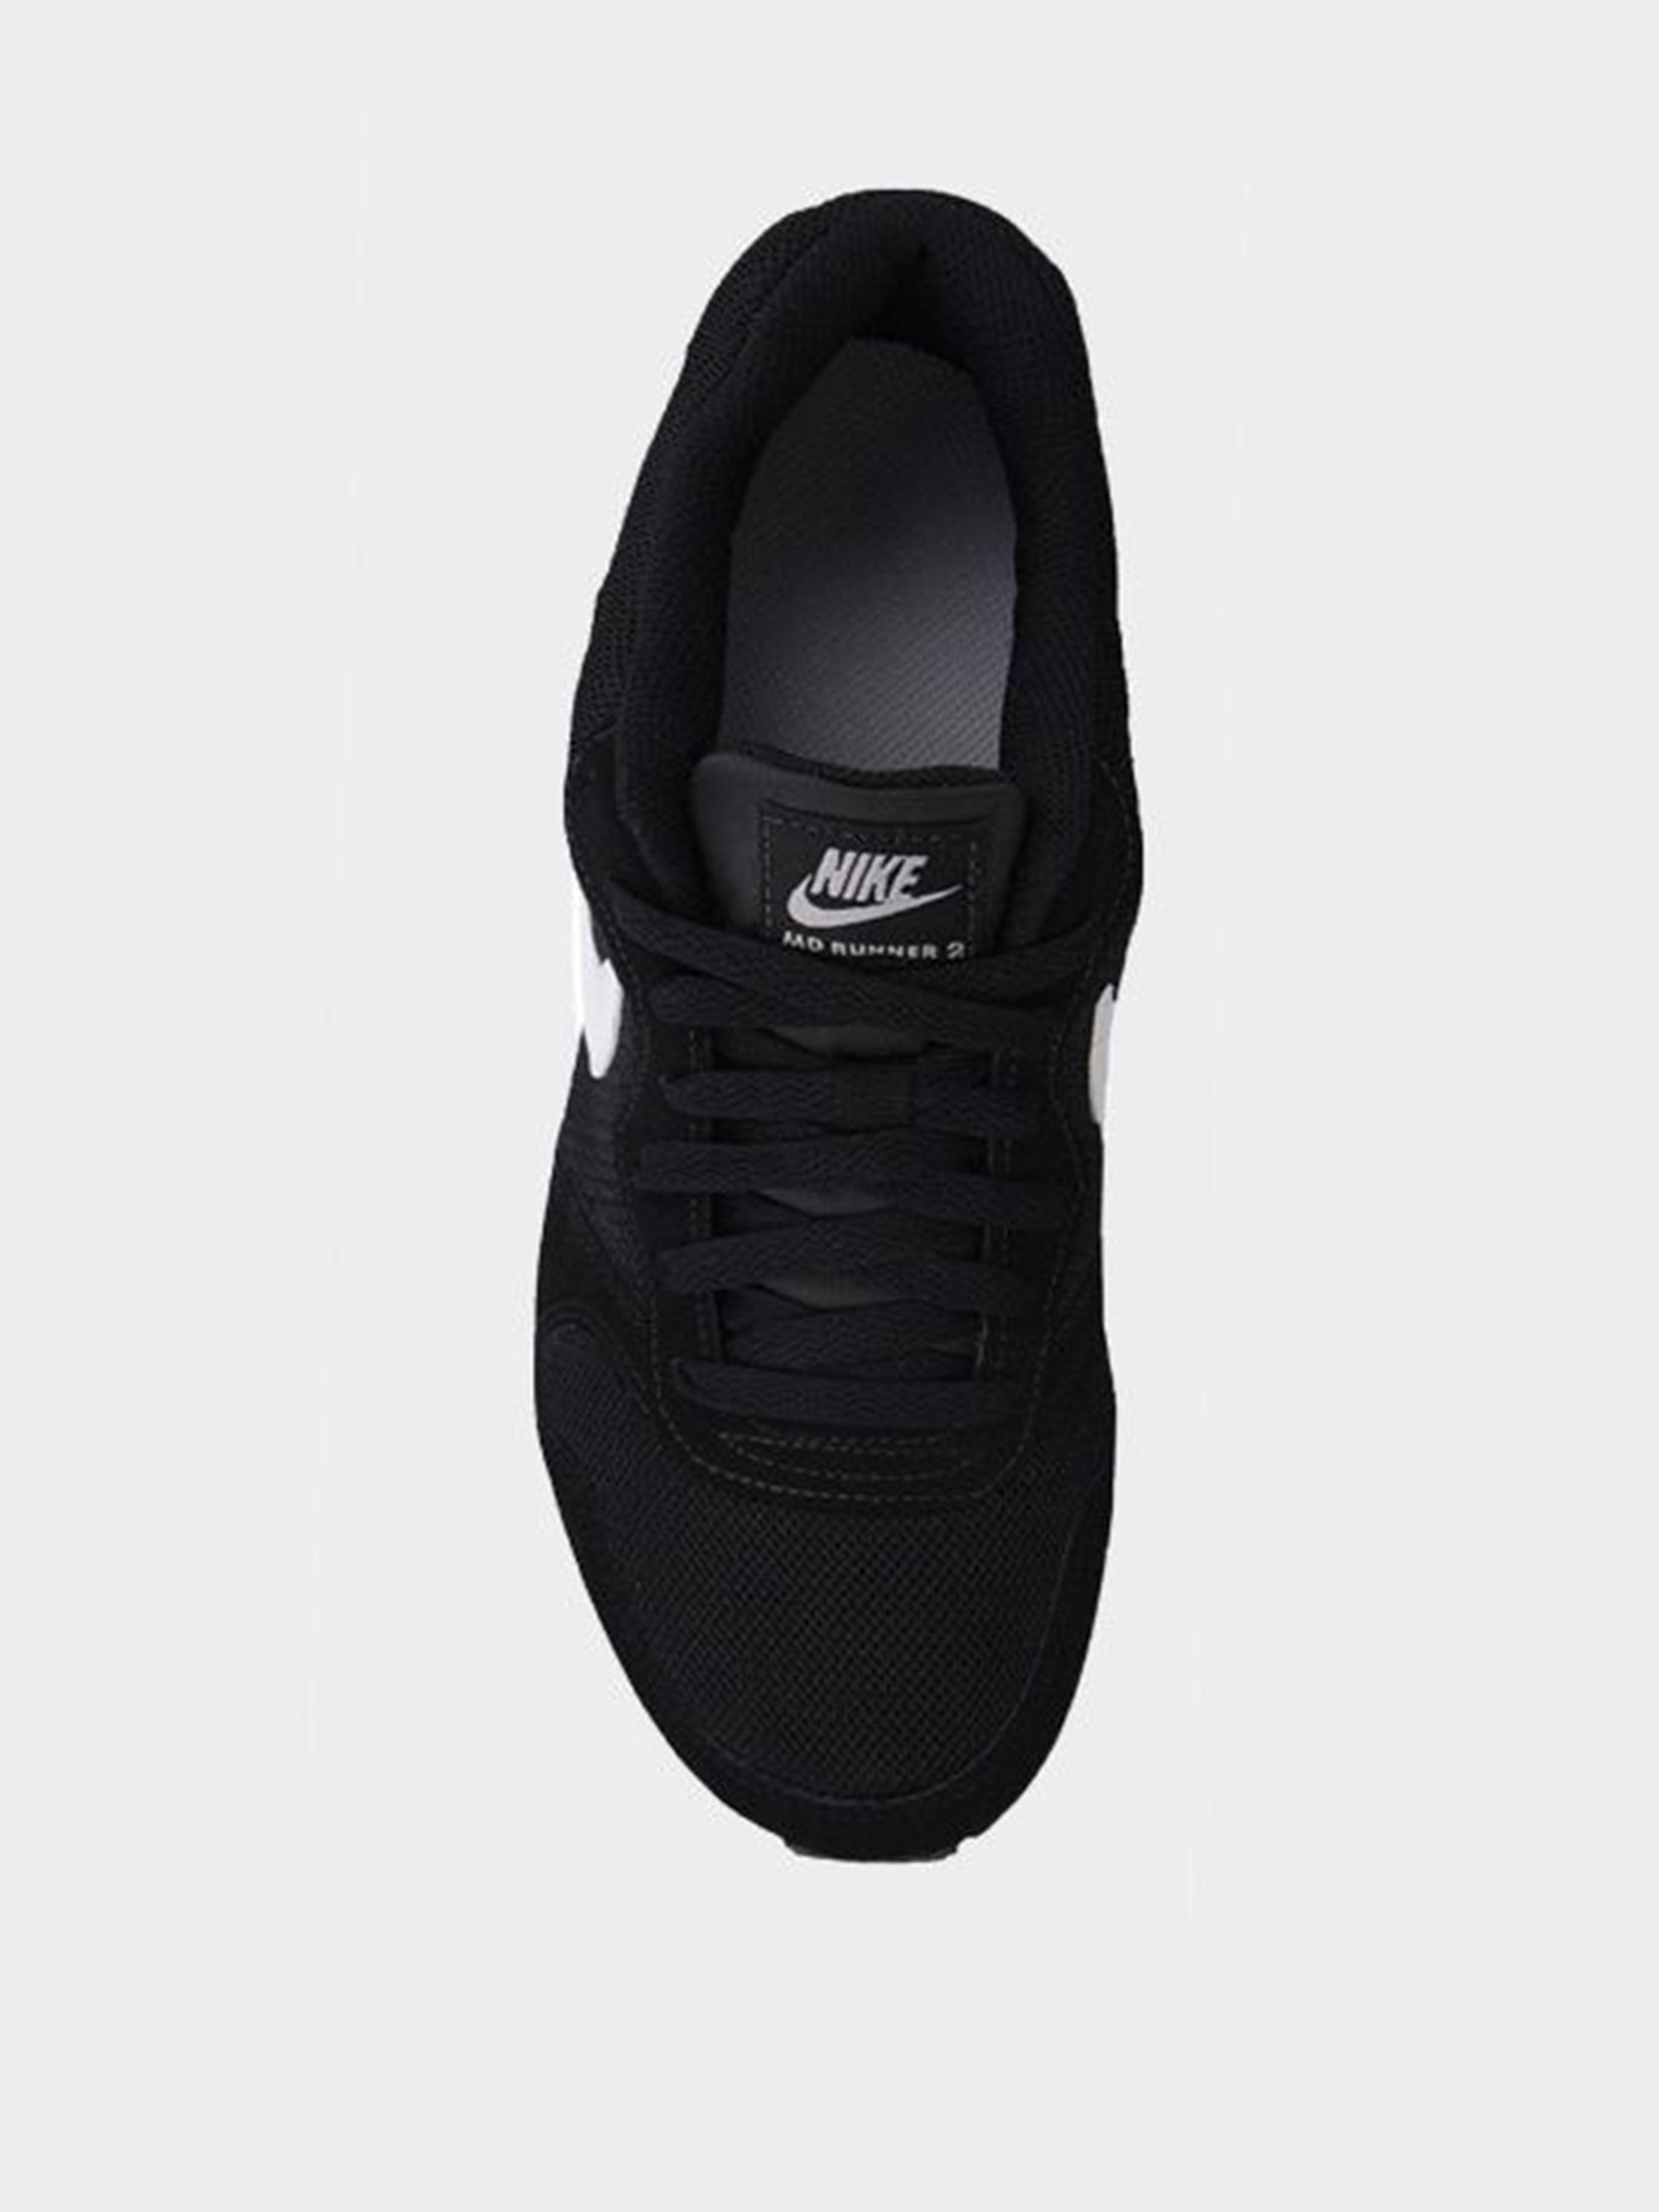 Кроссовки детские NIKE NIKE MD RUNNER 2 (GS) CG84 цена обуви, 2017